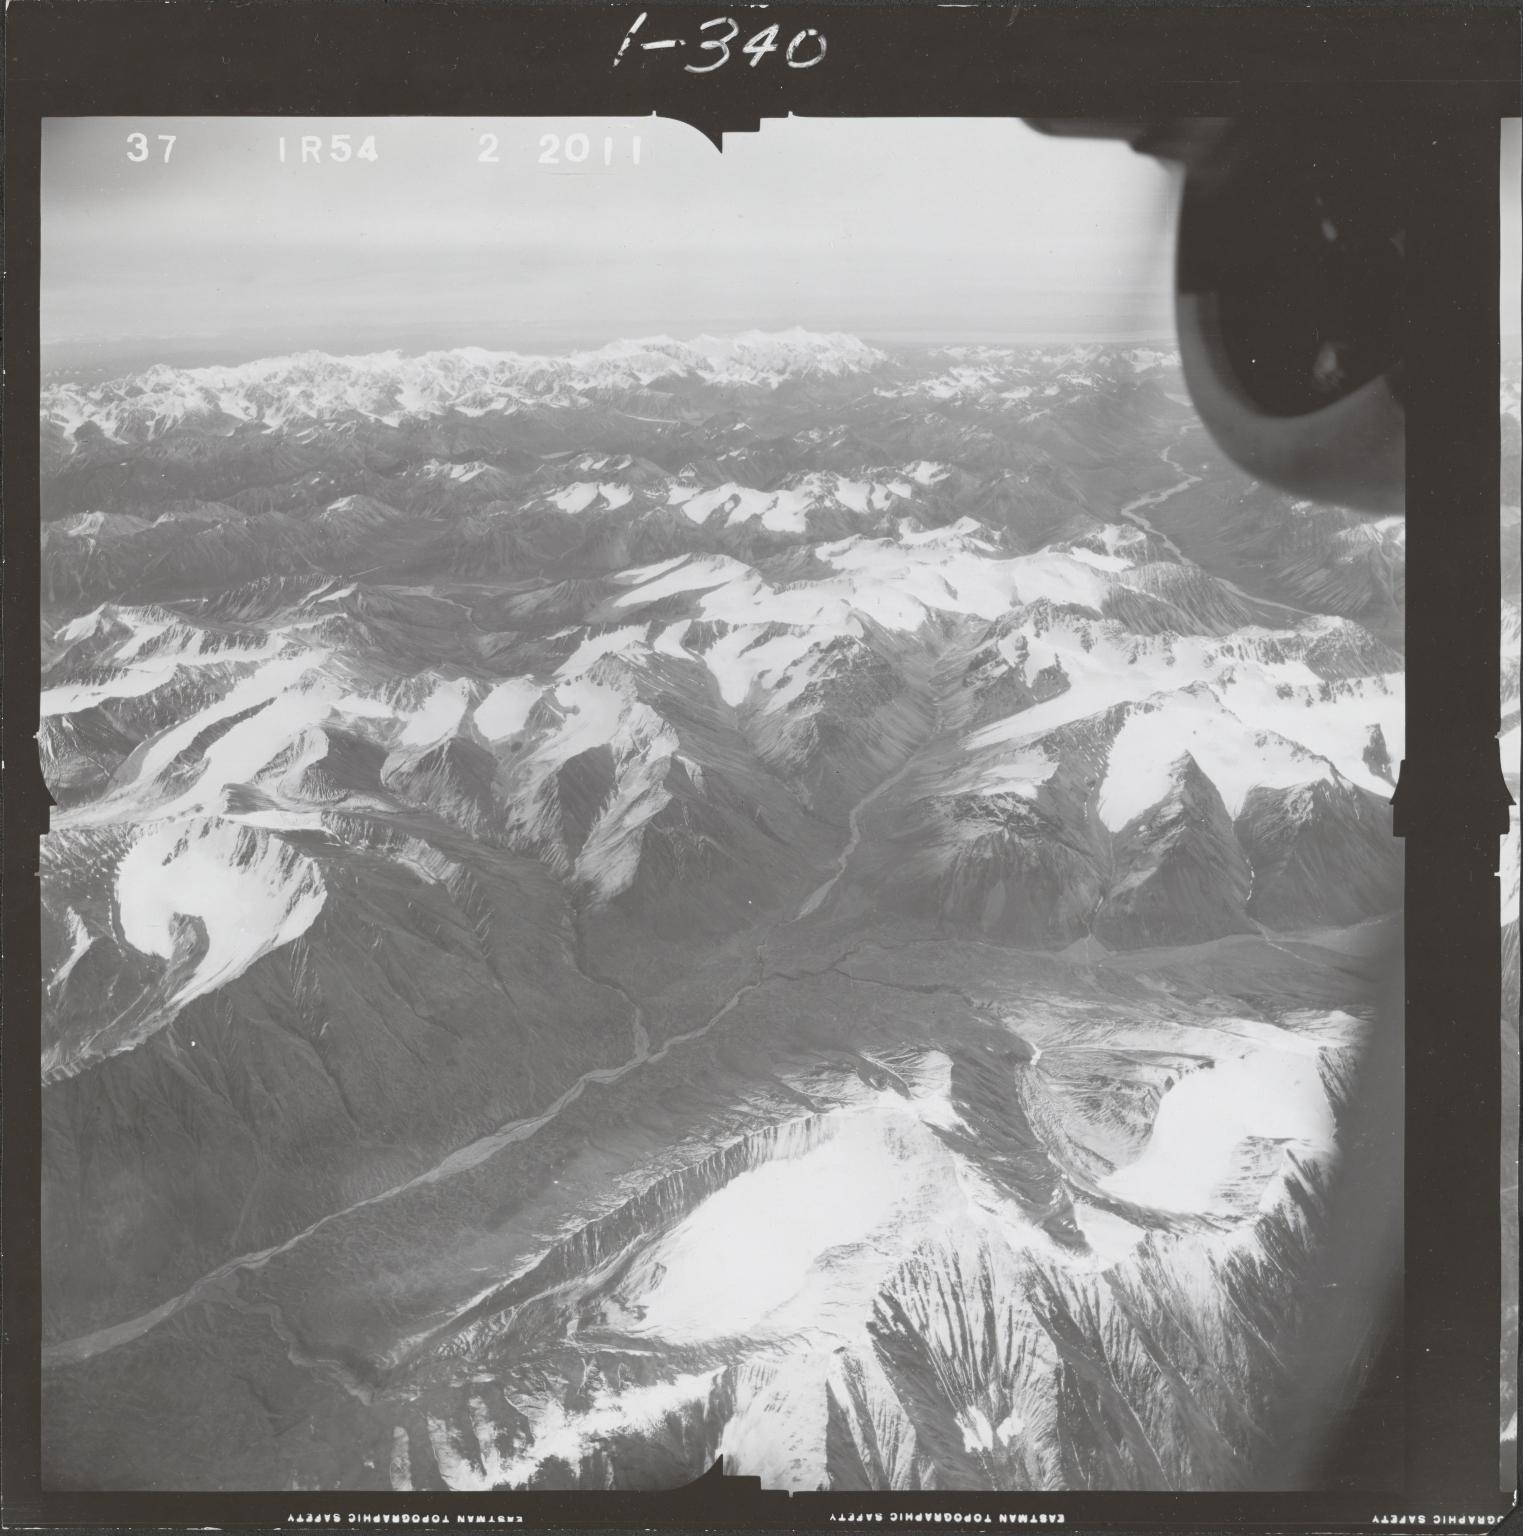 Northwest of Ch'akajabena Lake, aerial photograph FL 68 R-54, Alaska